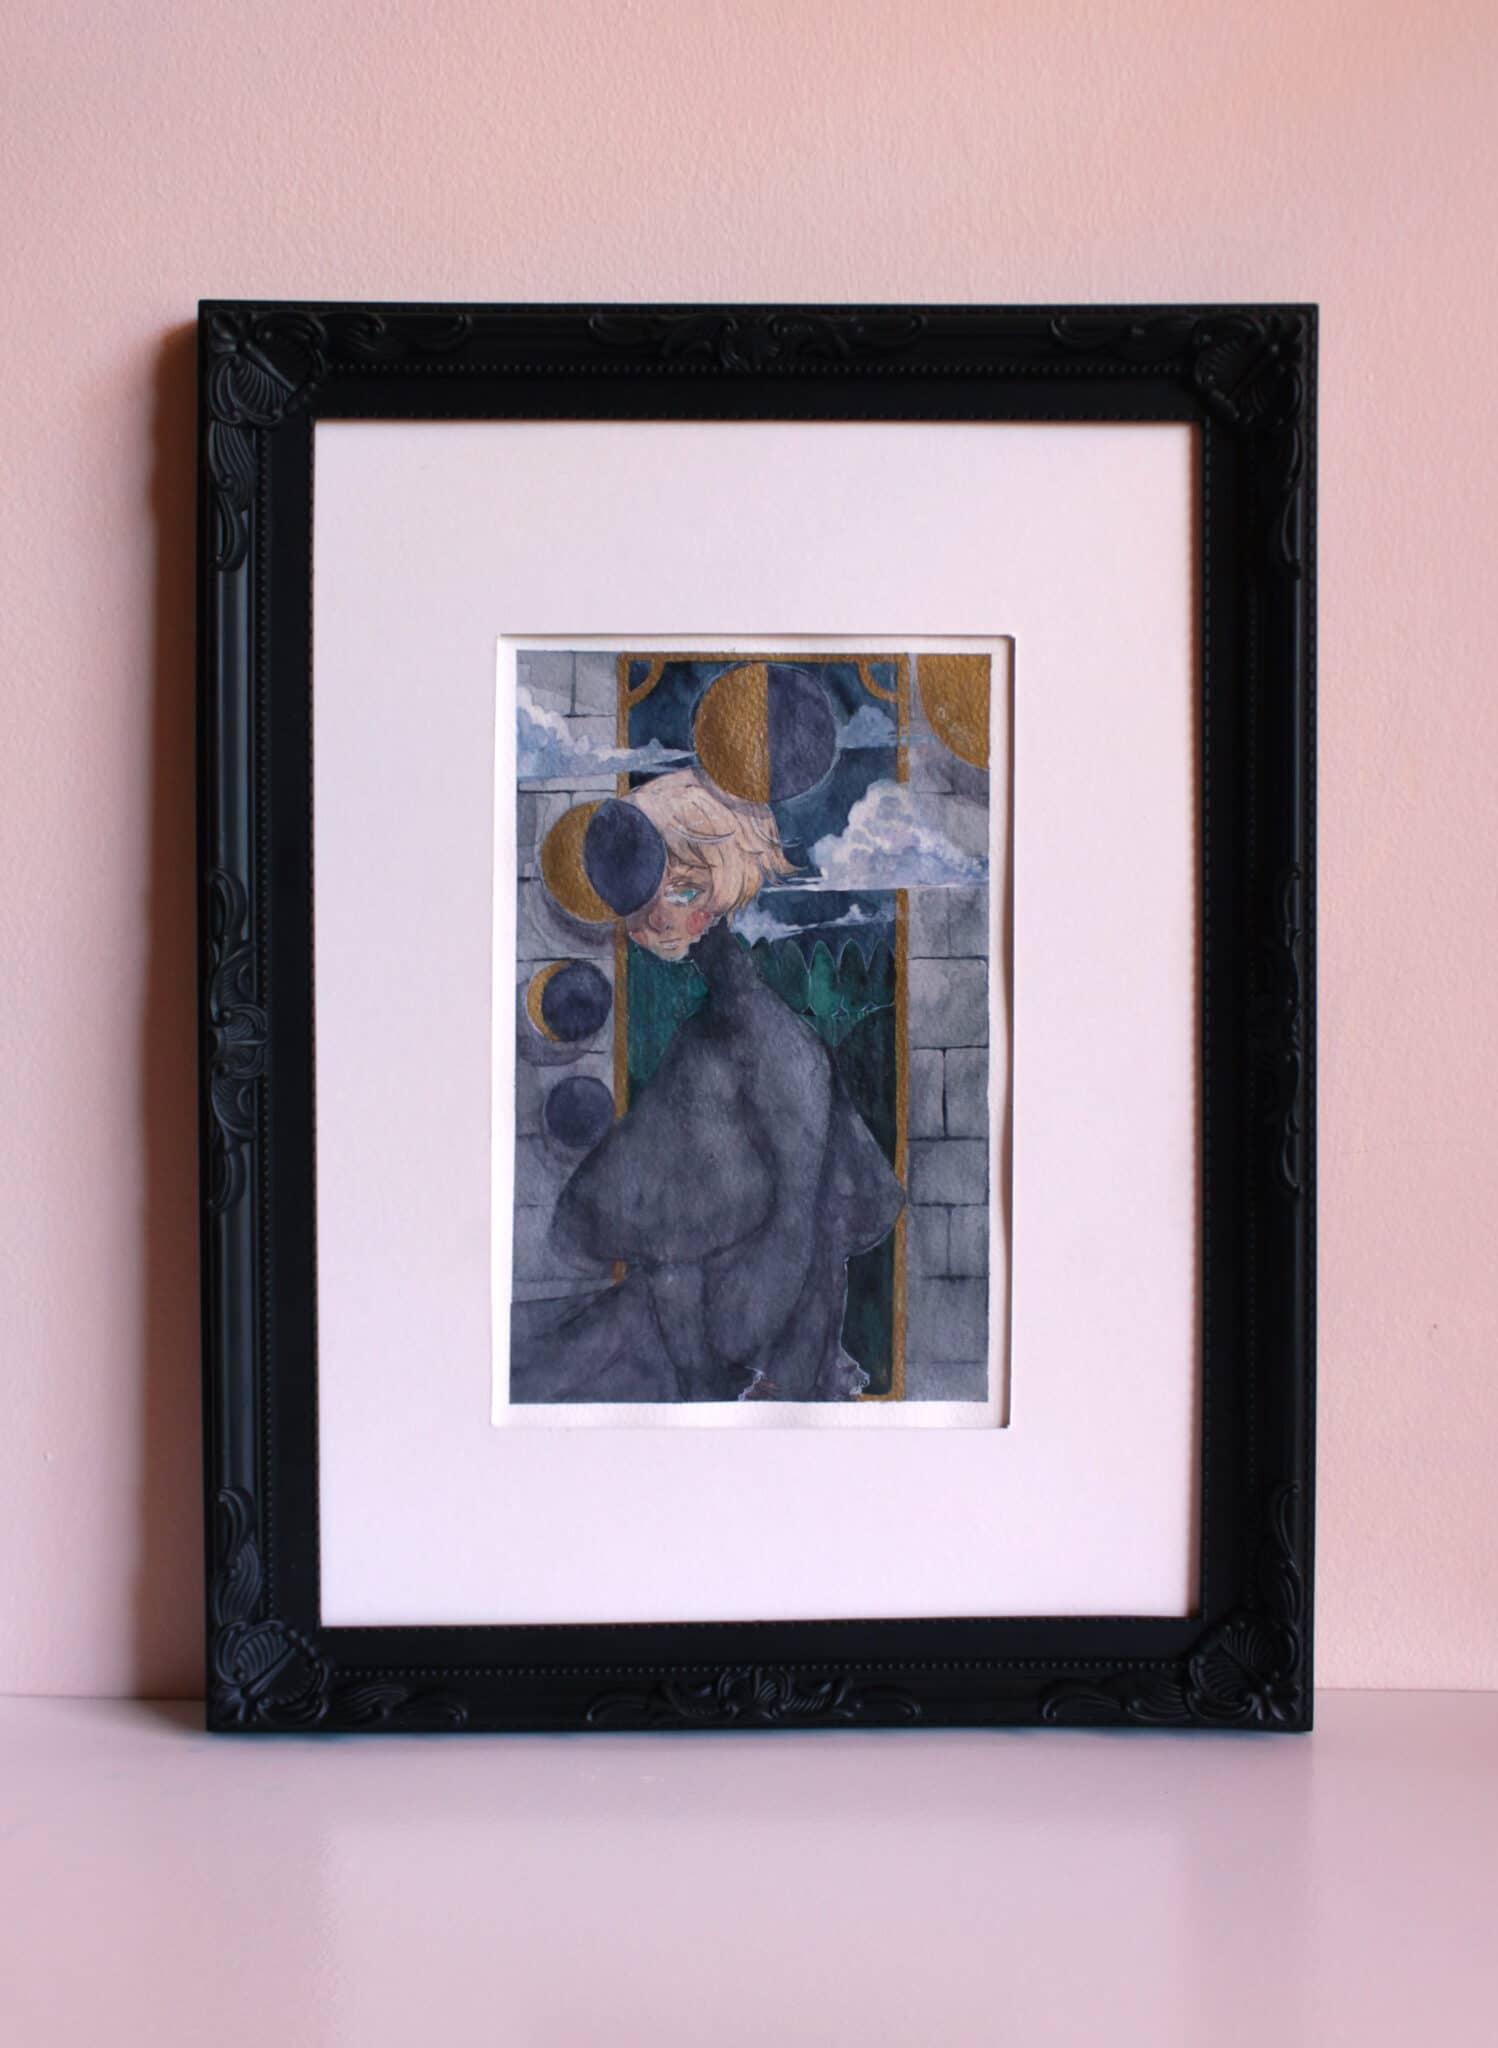 Alchemical Girls I – Celestine By Coraline Caroline (Almost Solo Exhibition)